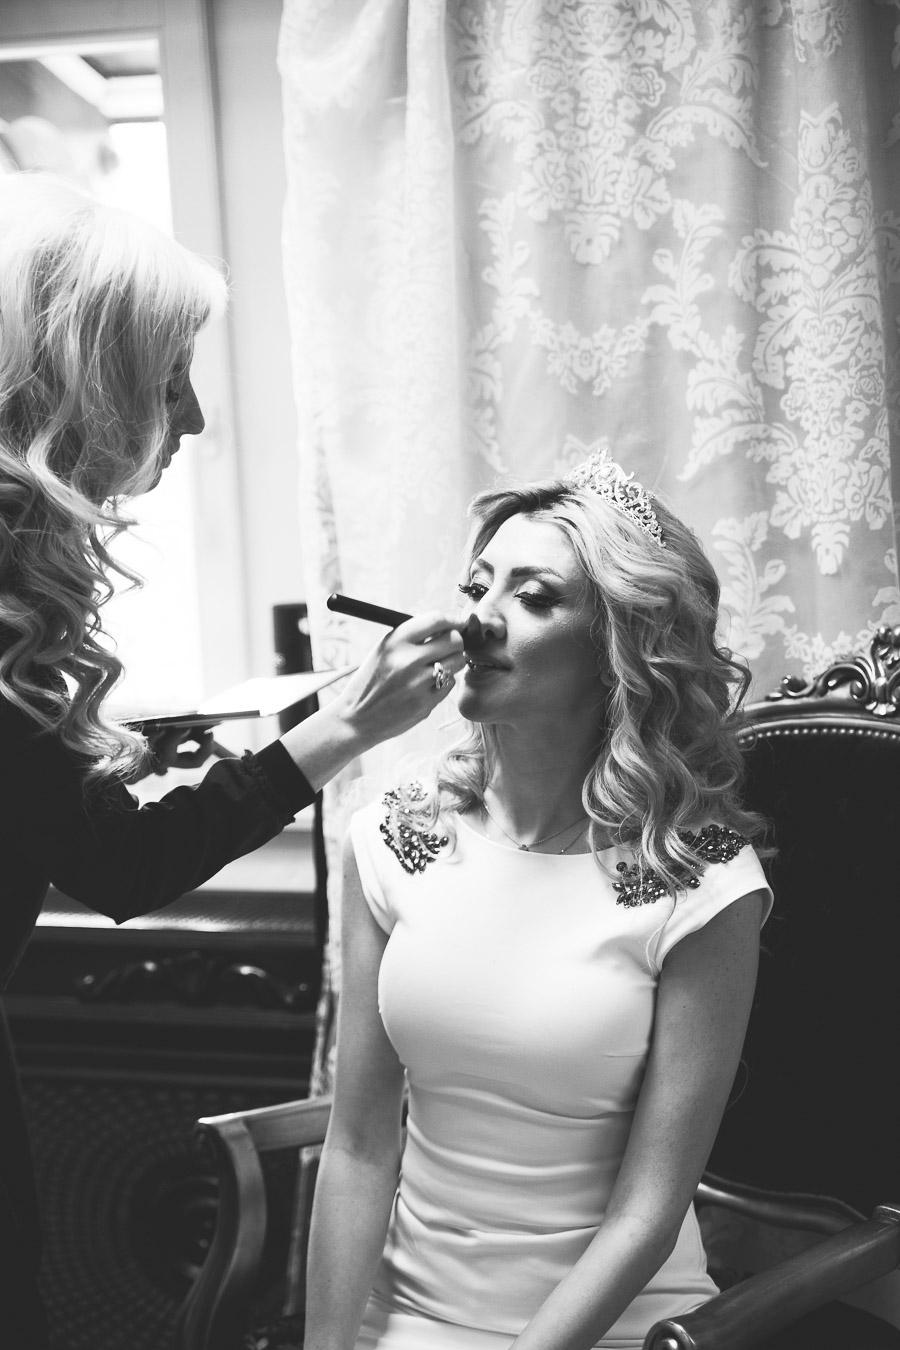 Die Braut wird geschminkt